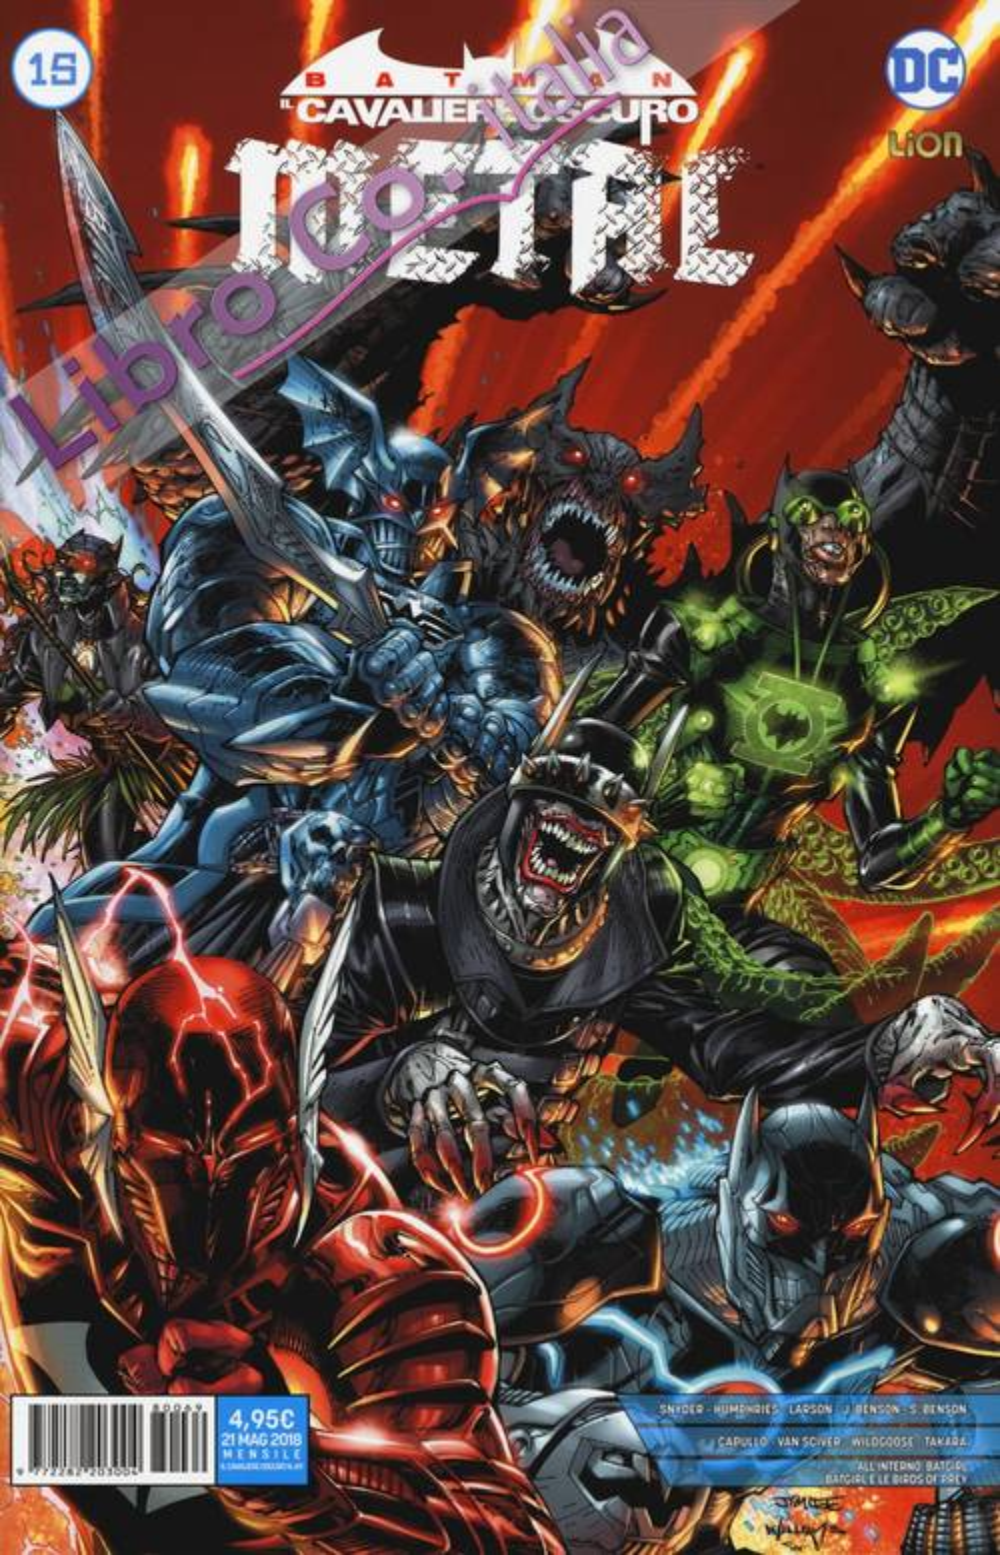 Metal. Batman. Il cavaliere oscuro. Vol. 15